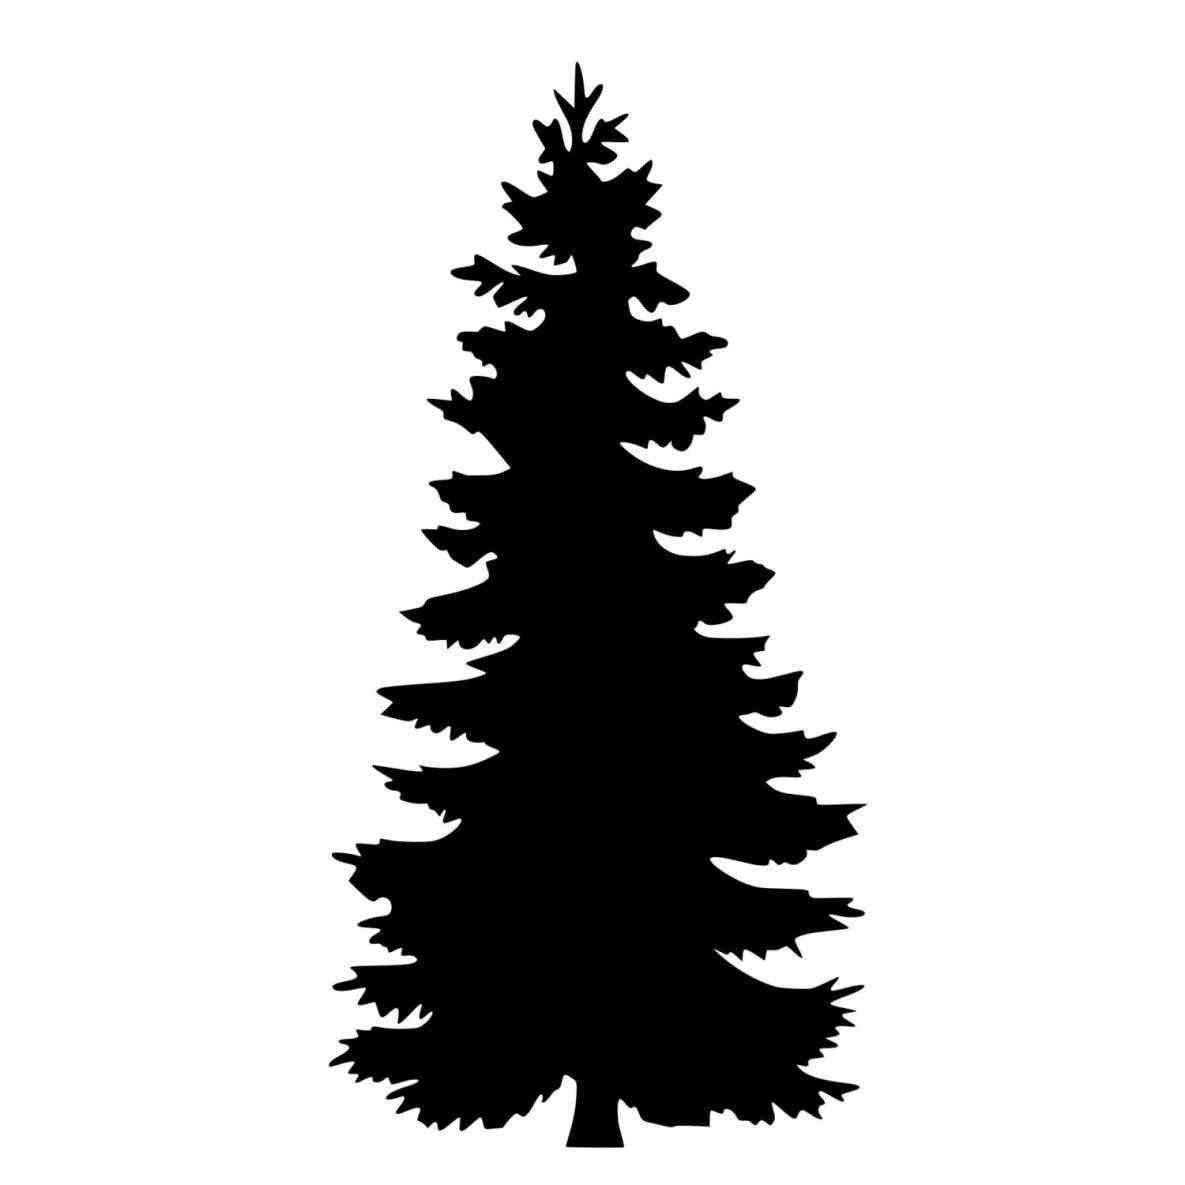 1185x1185 Evergreen Tree Silhouette.jpg National Parks